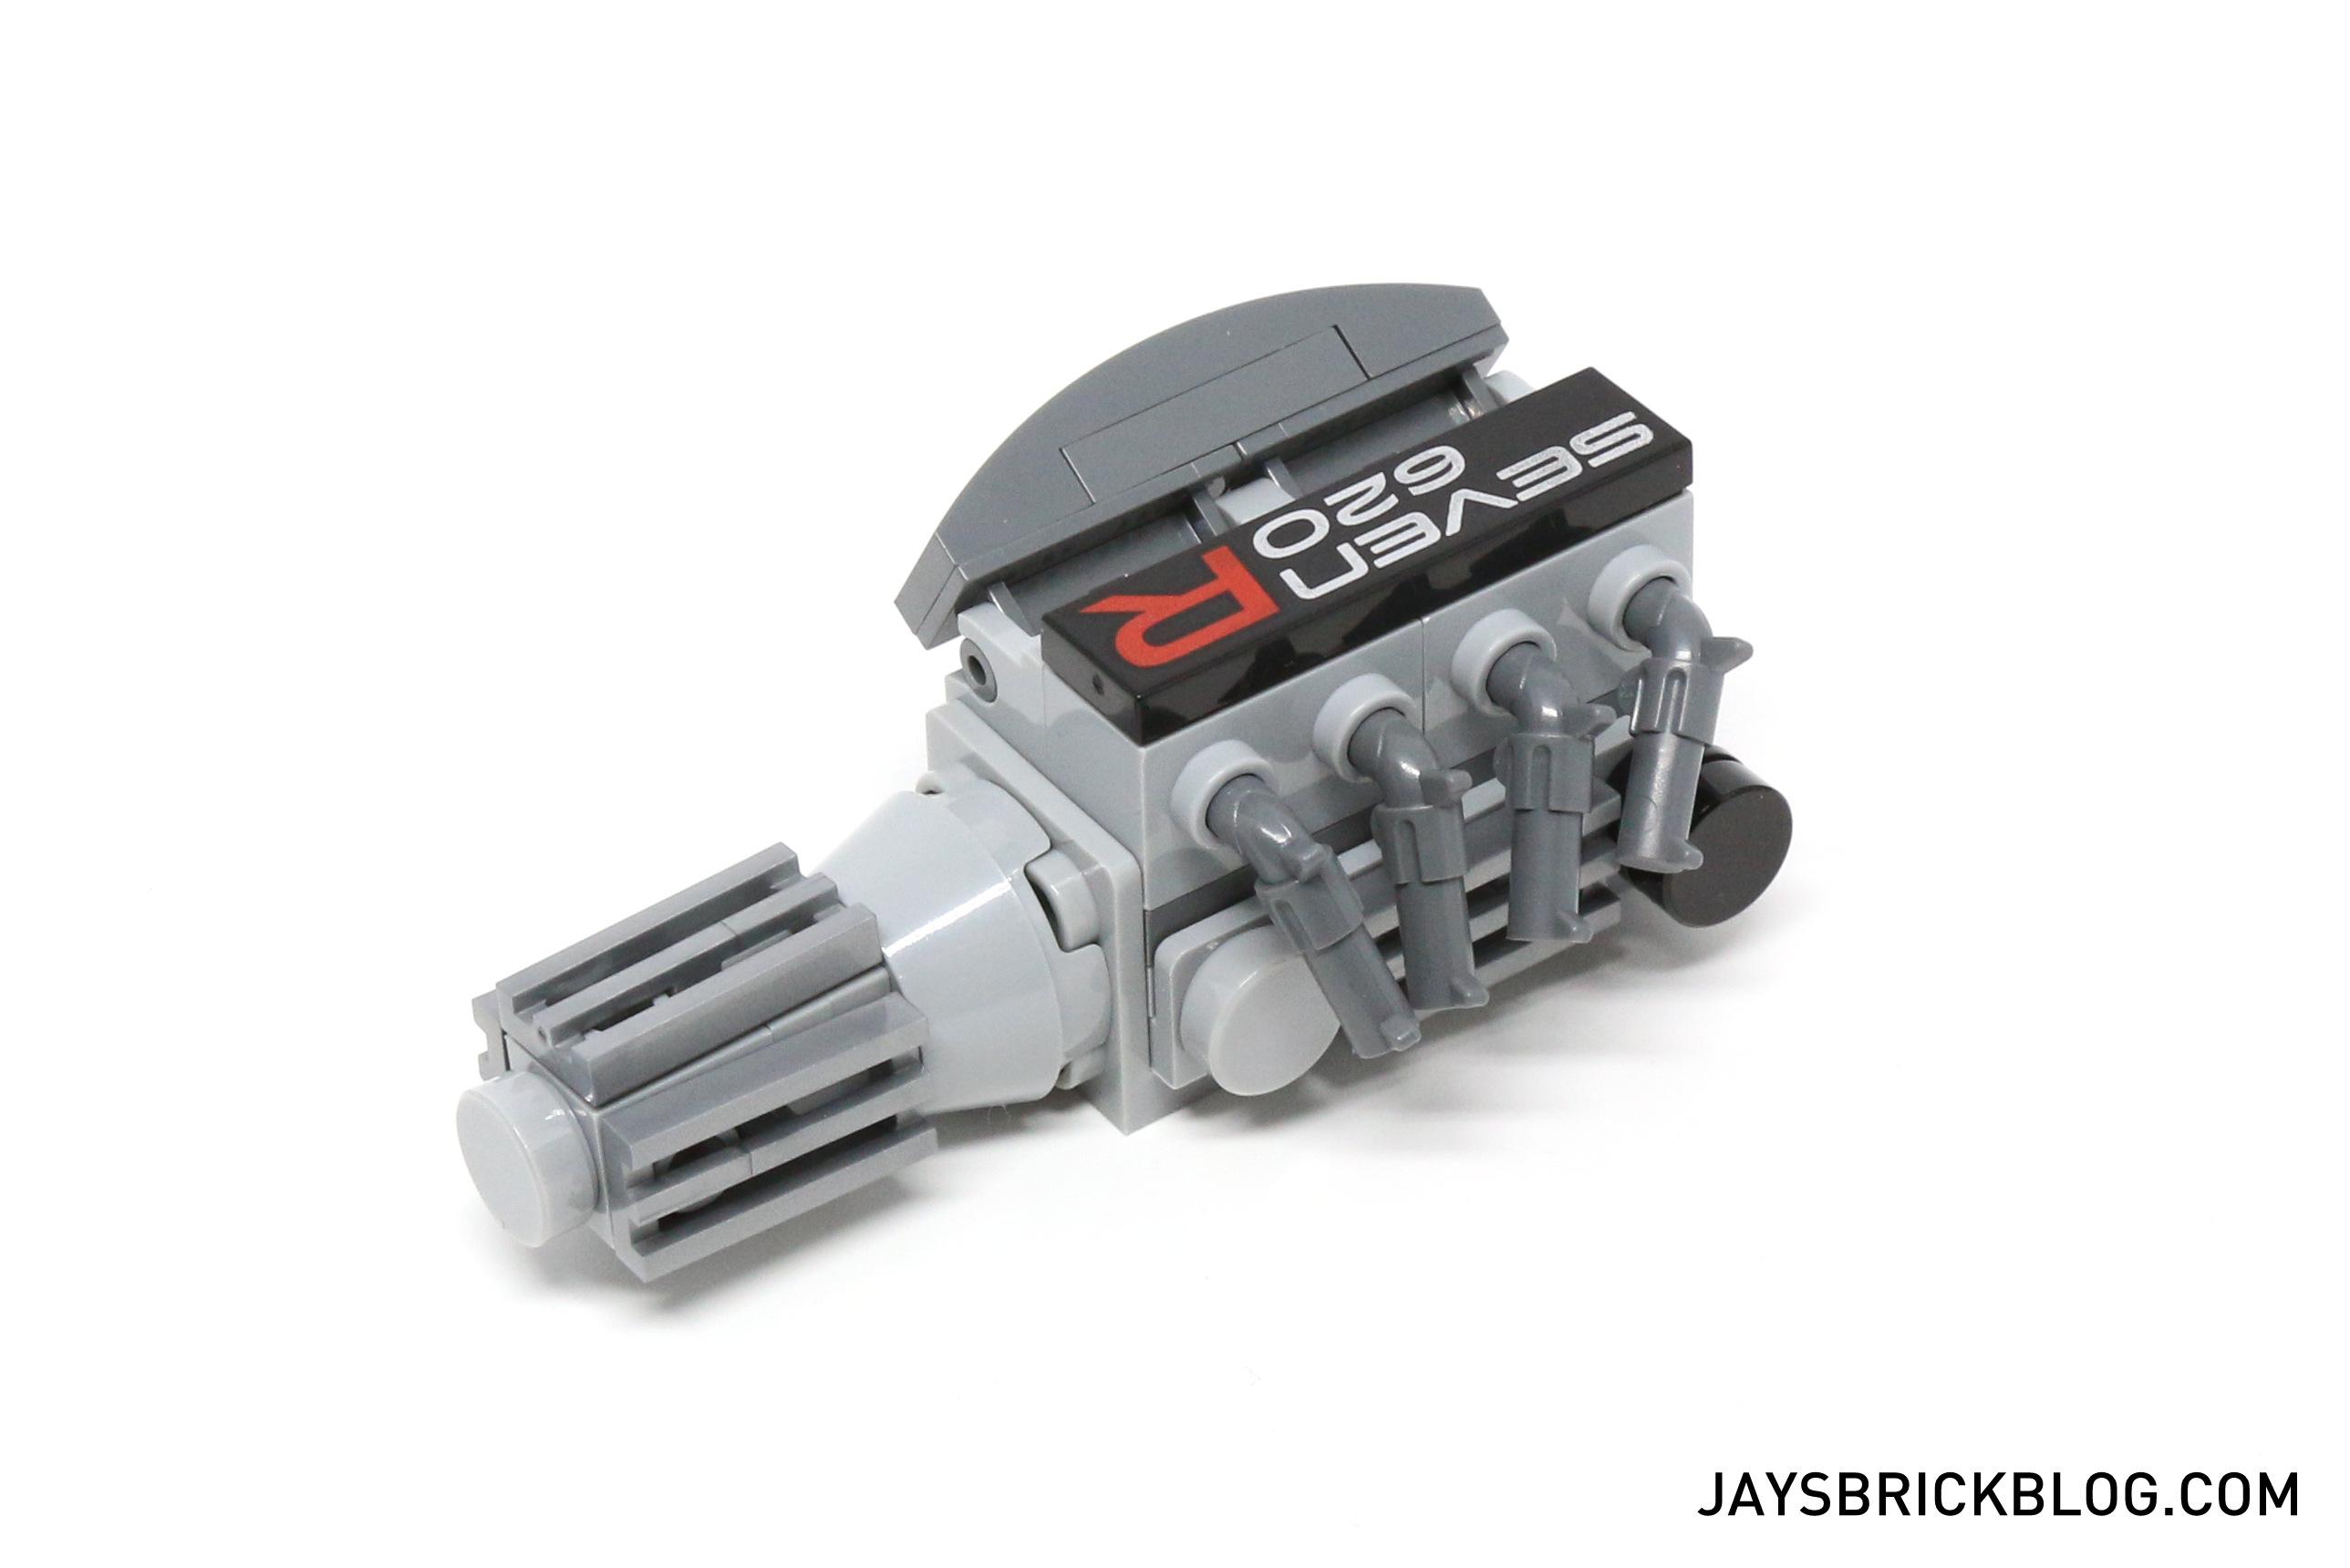 lego-21307-caterham-seven-engine